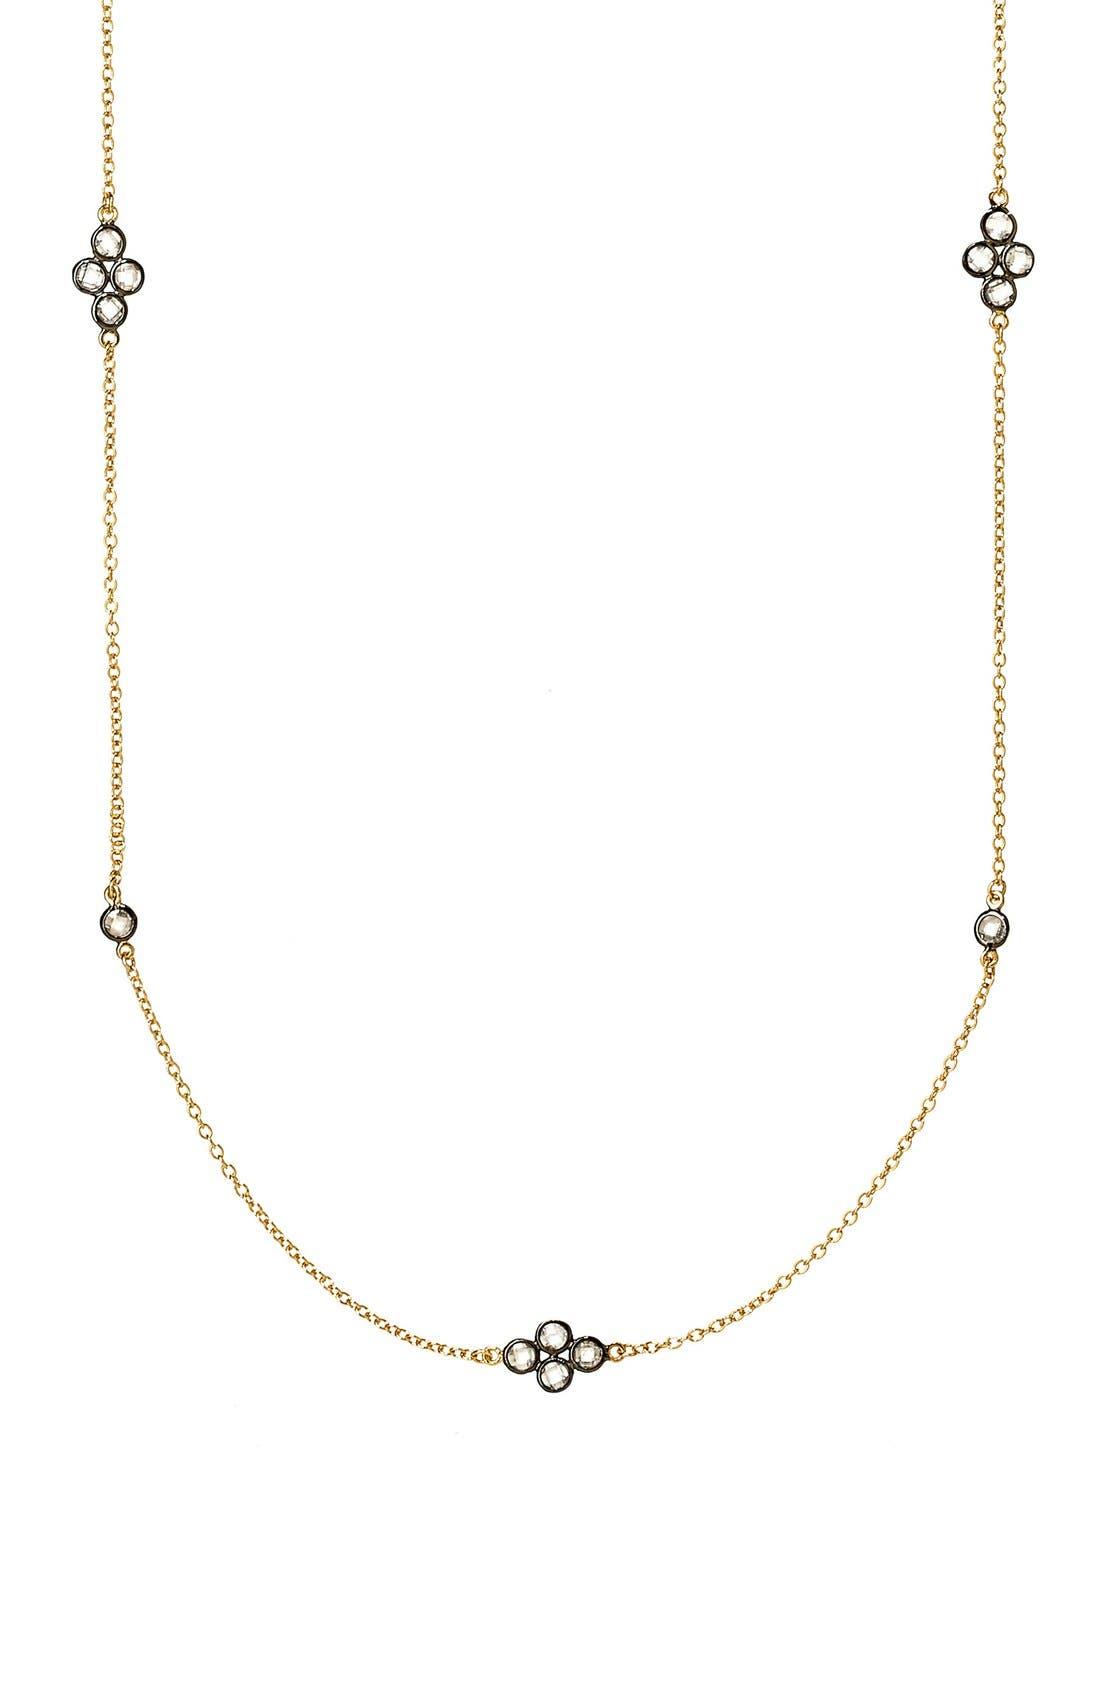 'The Standards' Long Station Necklace,                             Alternate thumbnail 5, color,                             GOLD/ GUNMETAL